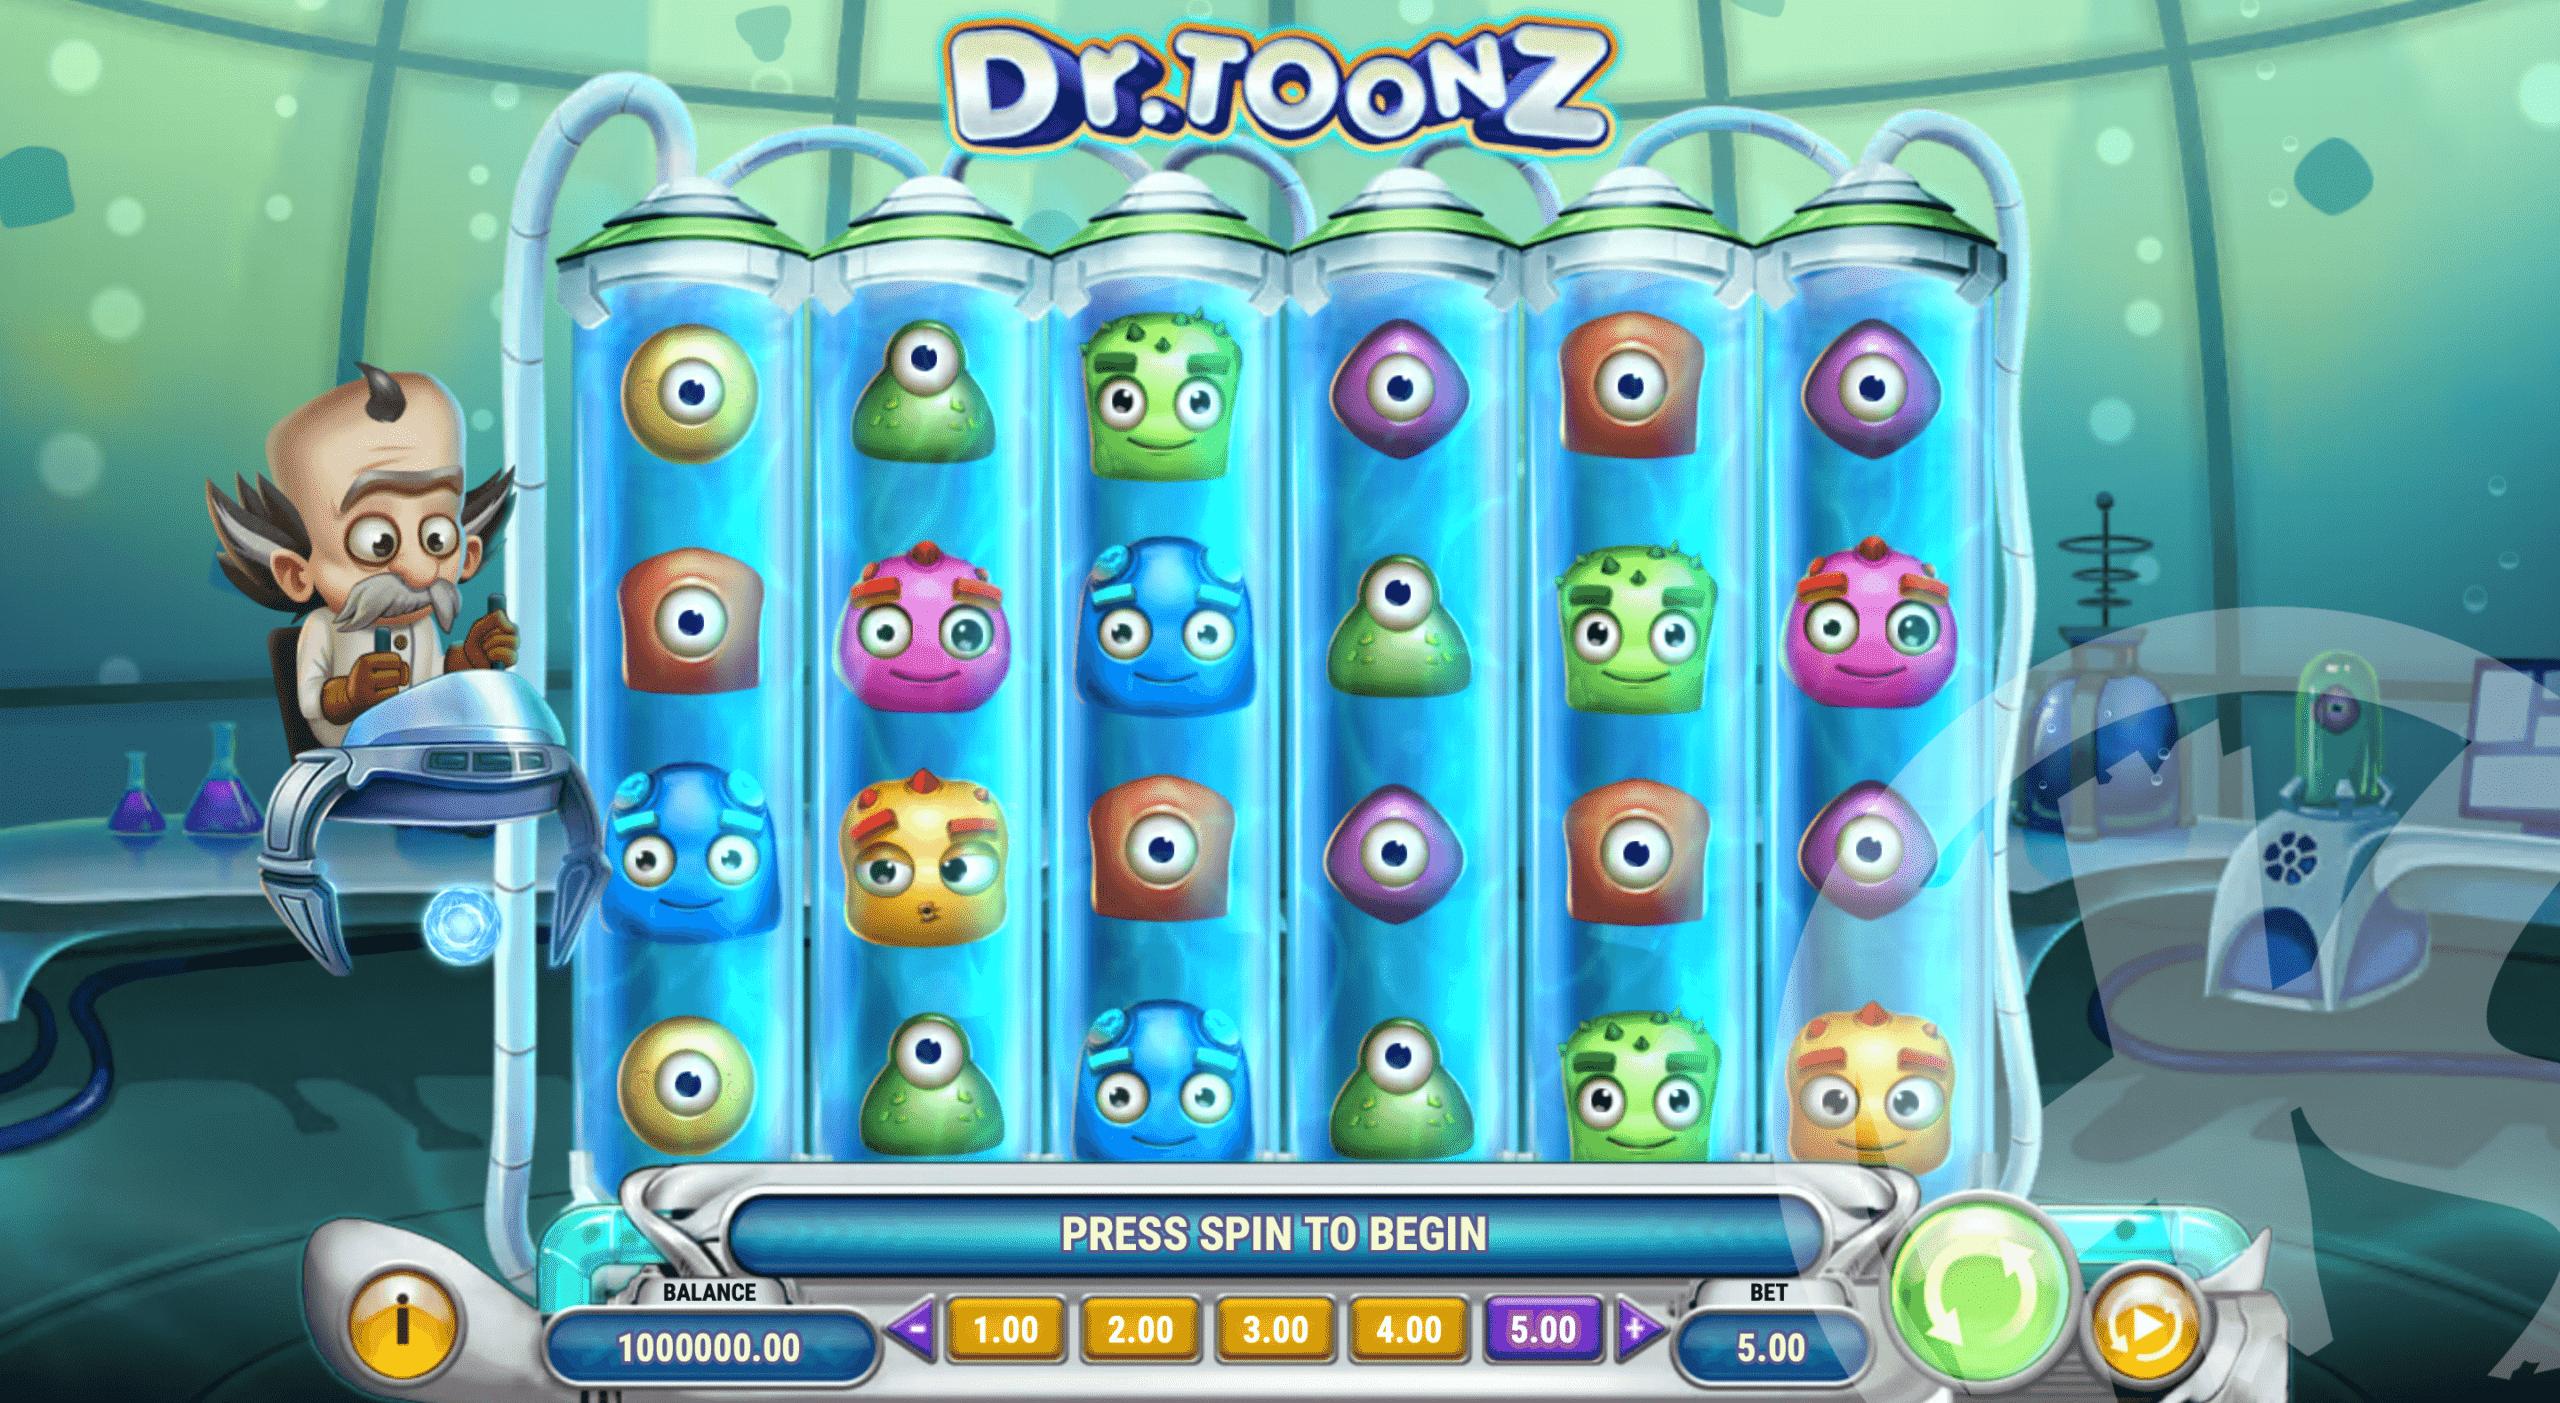 Dr. Toonz Base Game